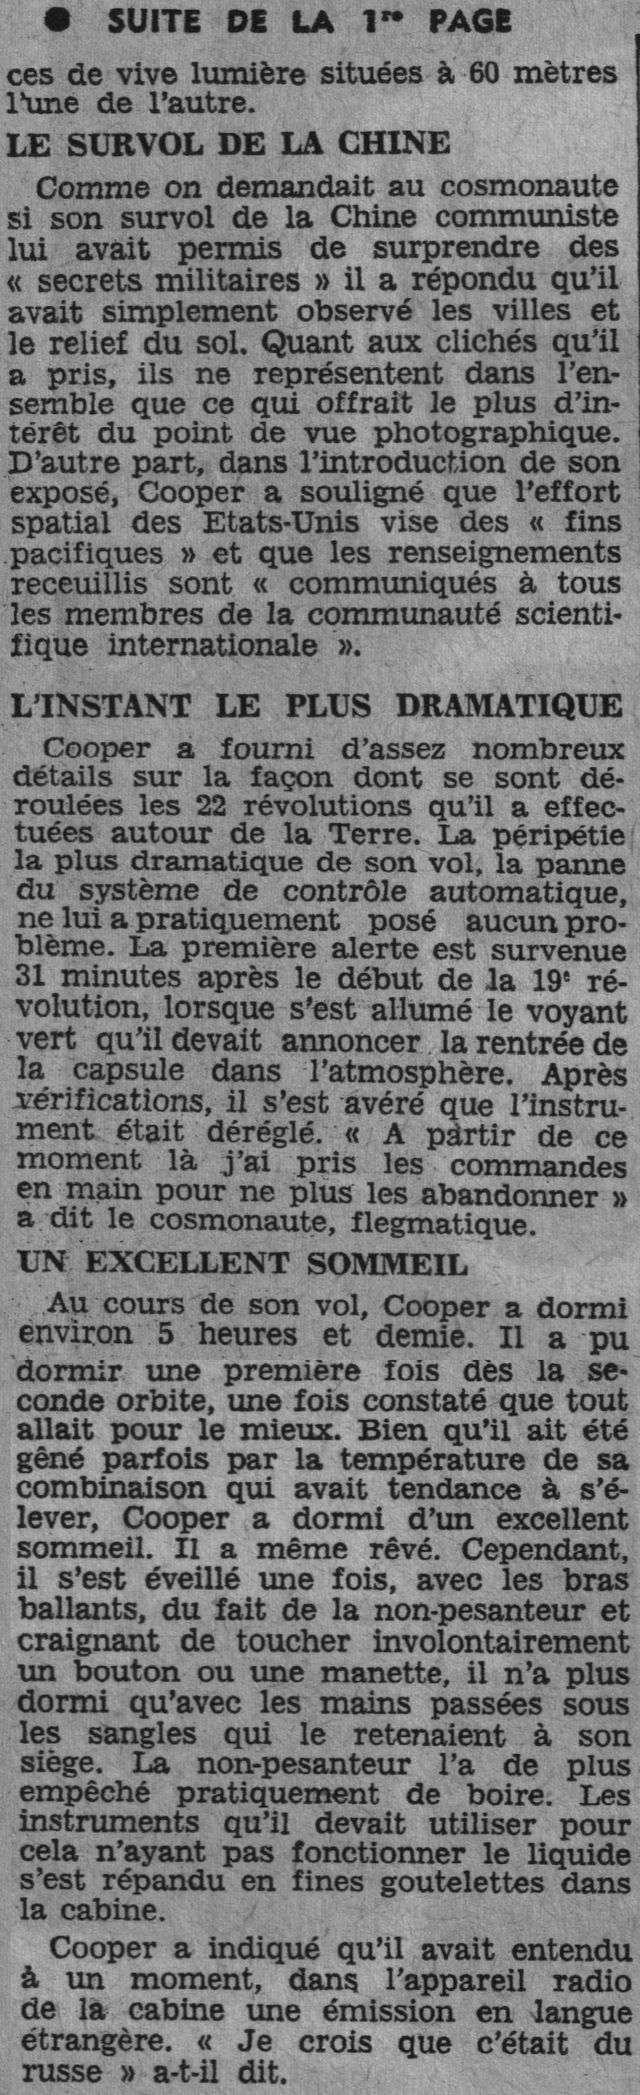 15 mai 1963 - Mercury Atlas  3 - Gordon Cooper 63052111